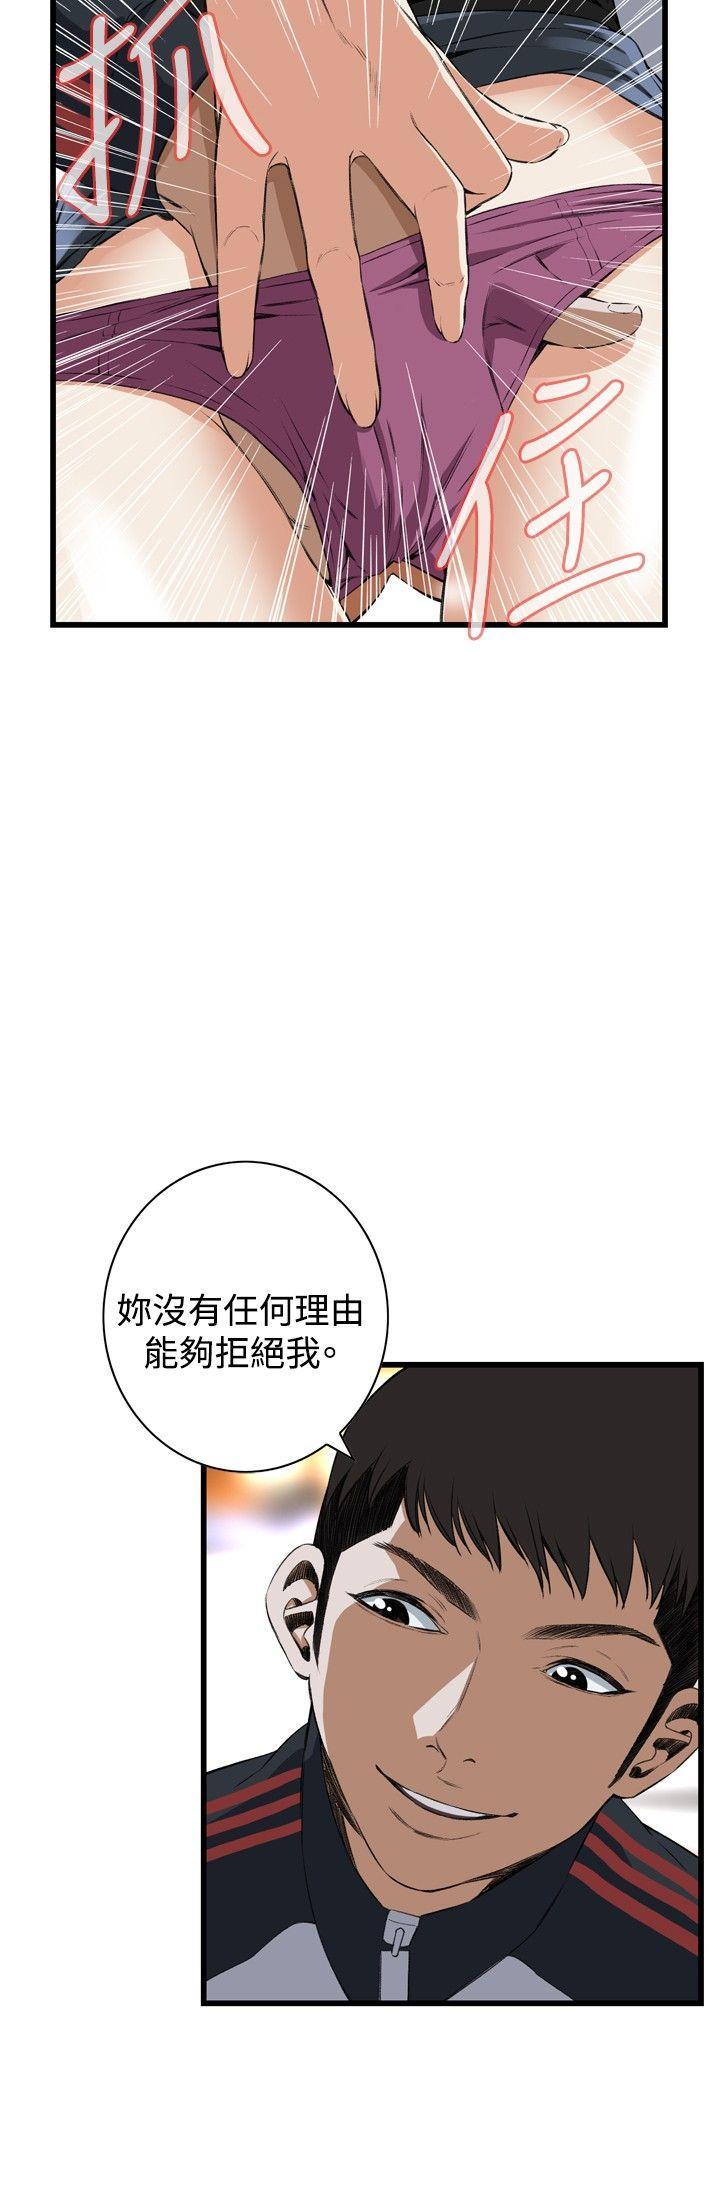 Take a Peek 偷窥 Ch.39~60 [Chinese]中文 570